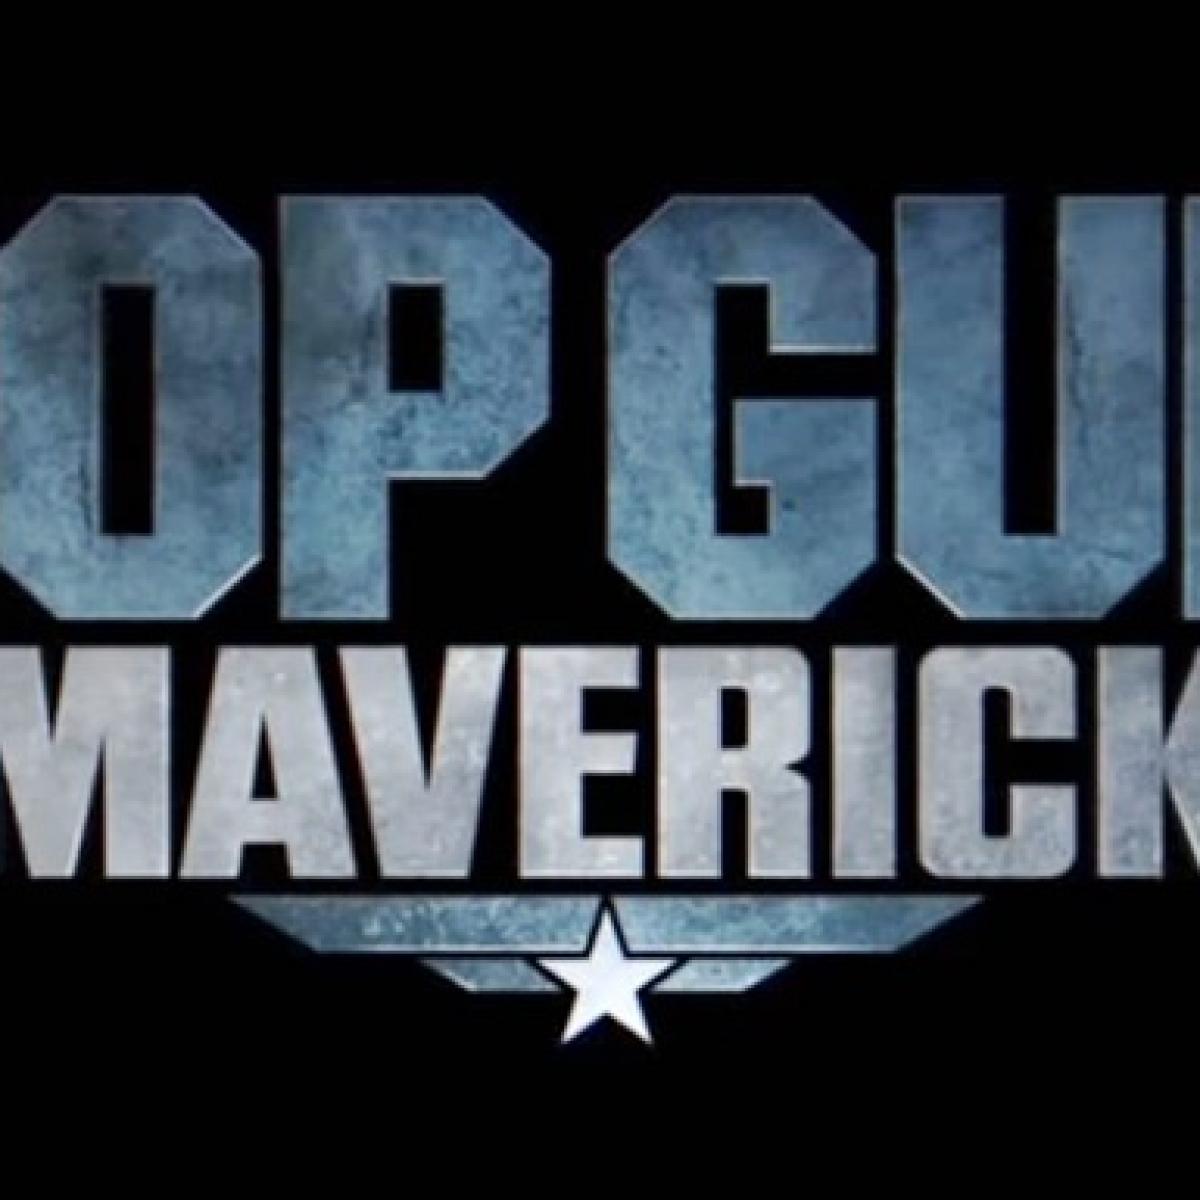 'Top Gun: Maverick' trailer: Tom Cruise is back in action!